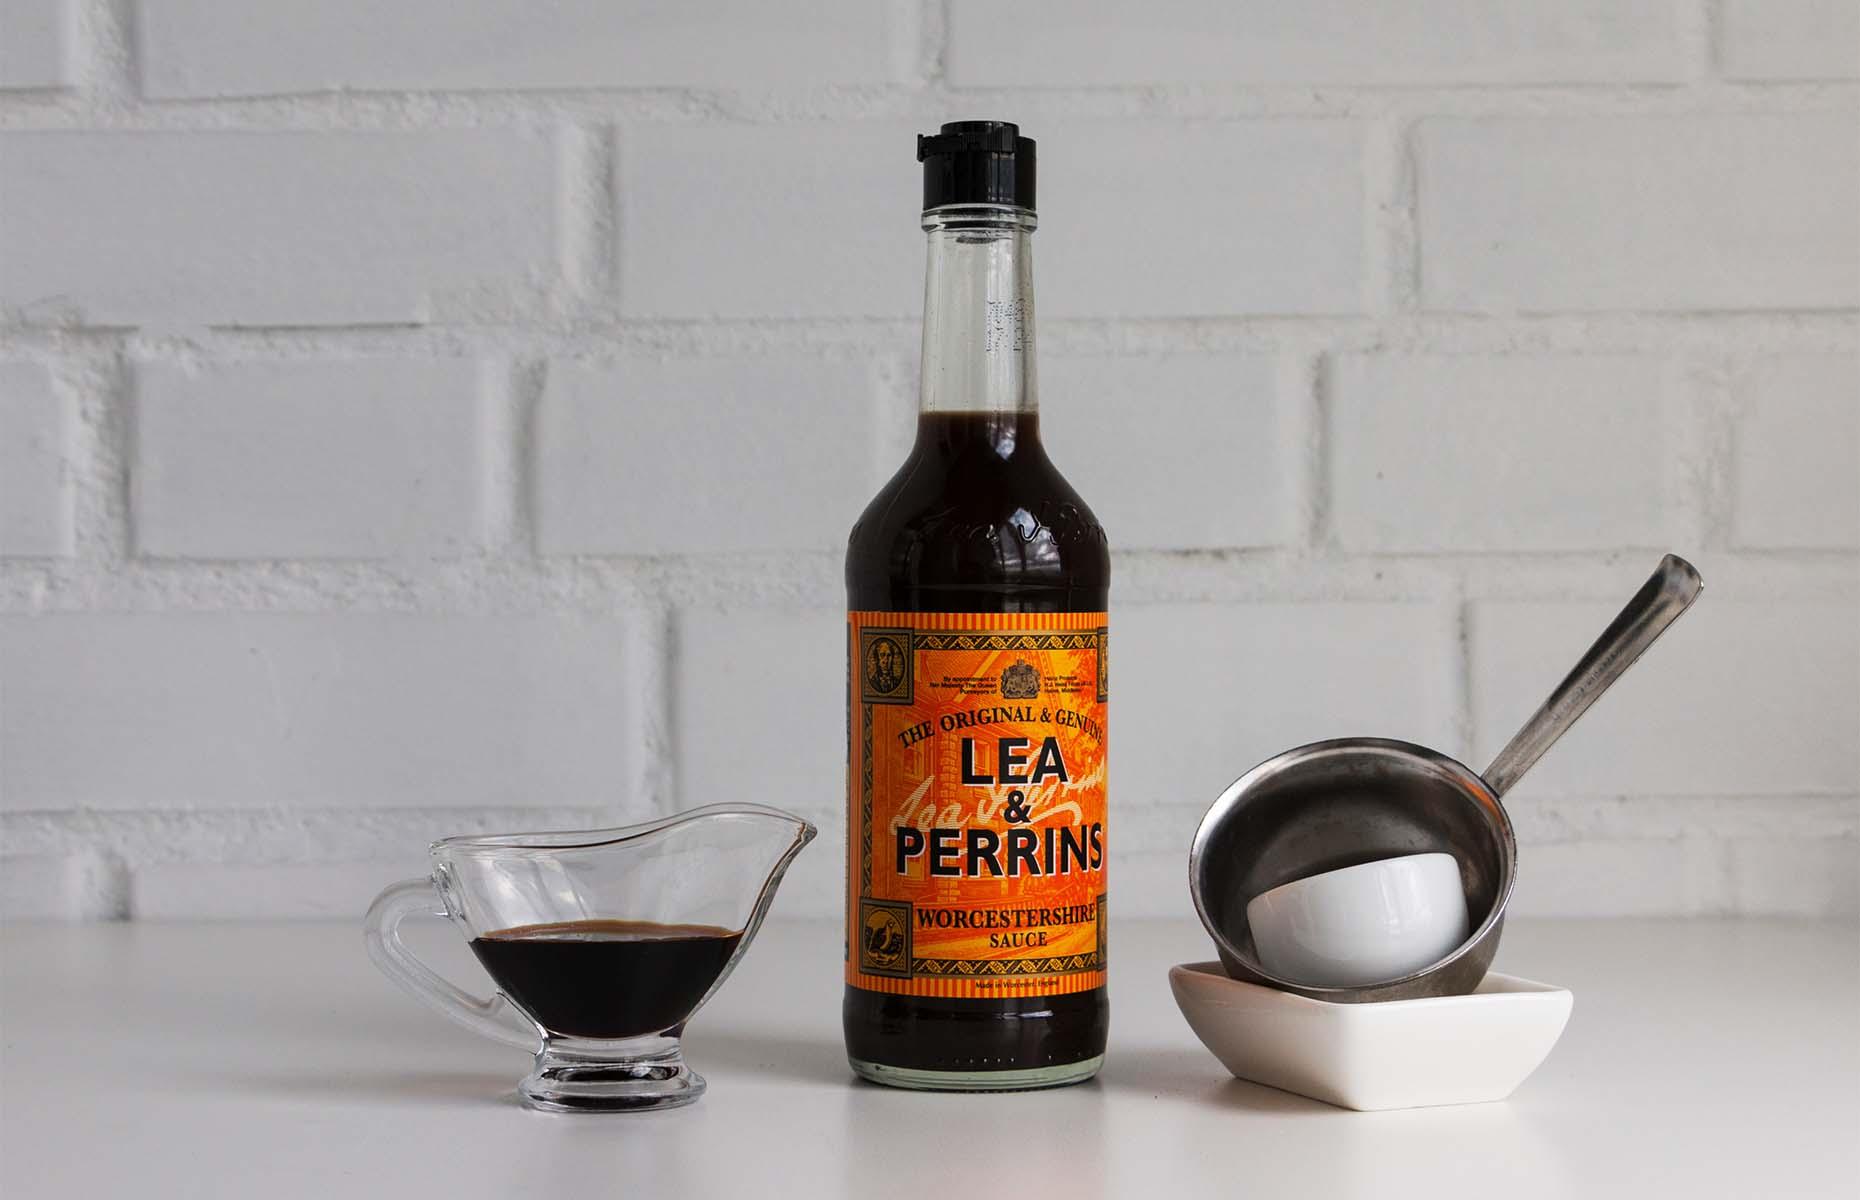 Worcestershire sauce (Image: Studio Dagdagaz/Shutterstock)